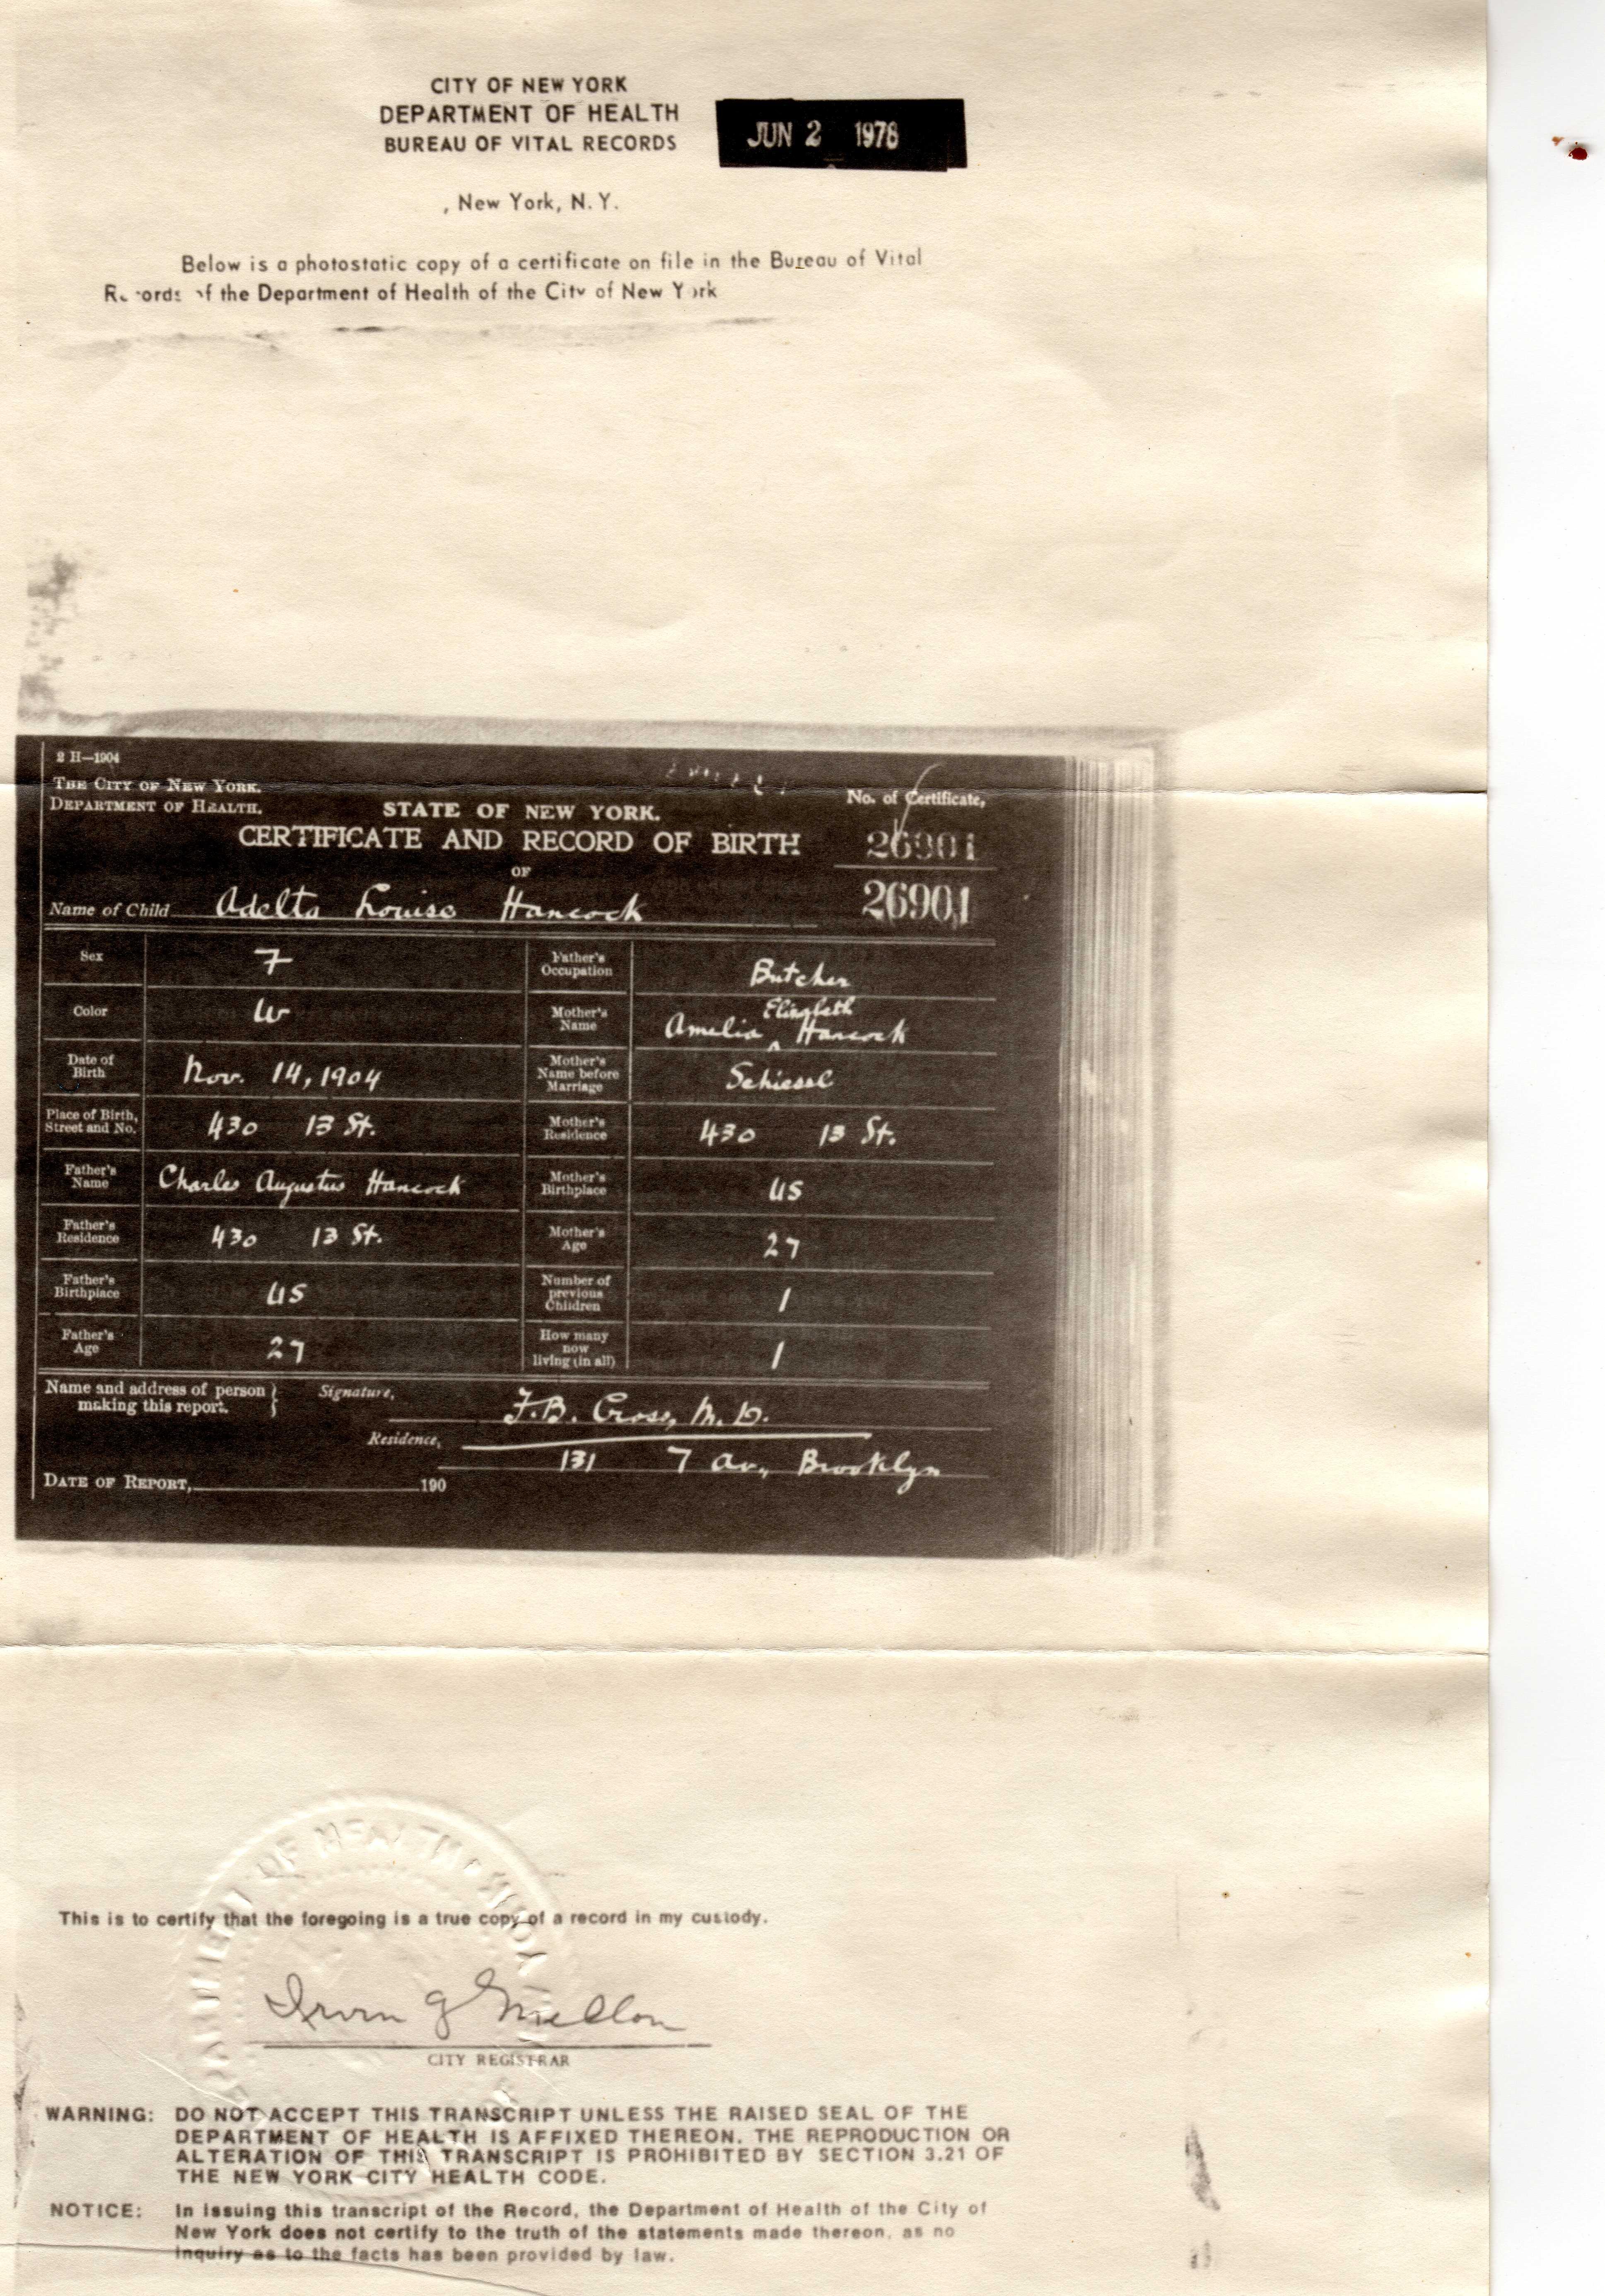 Madeline hancock birth certificate original digital image 3875 x 5544 pixels aiddatafo Image collections